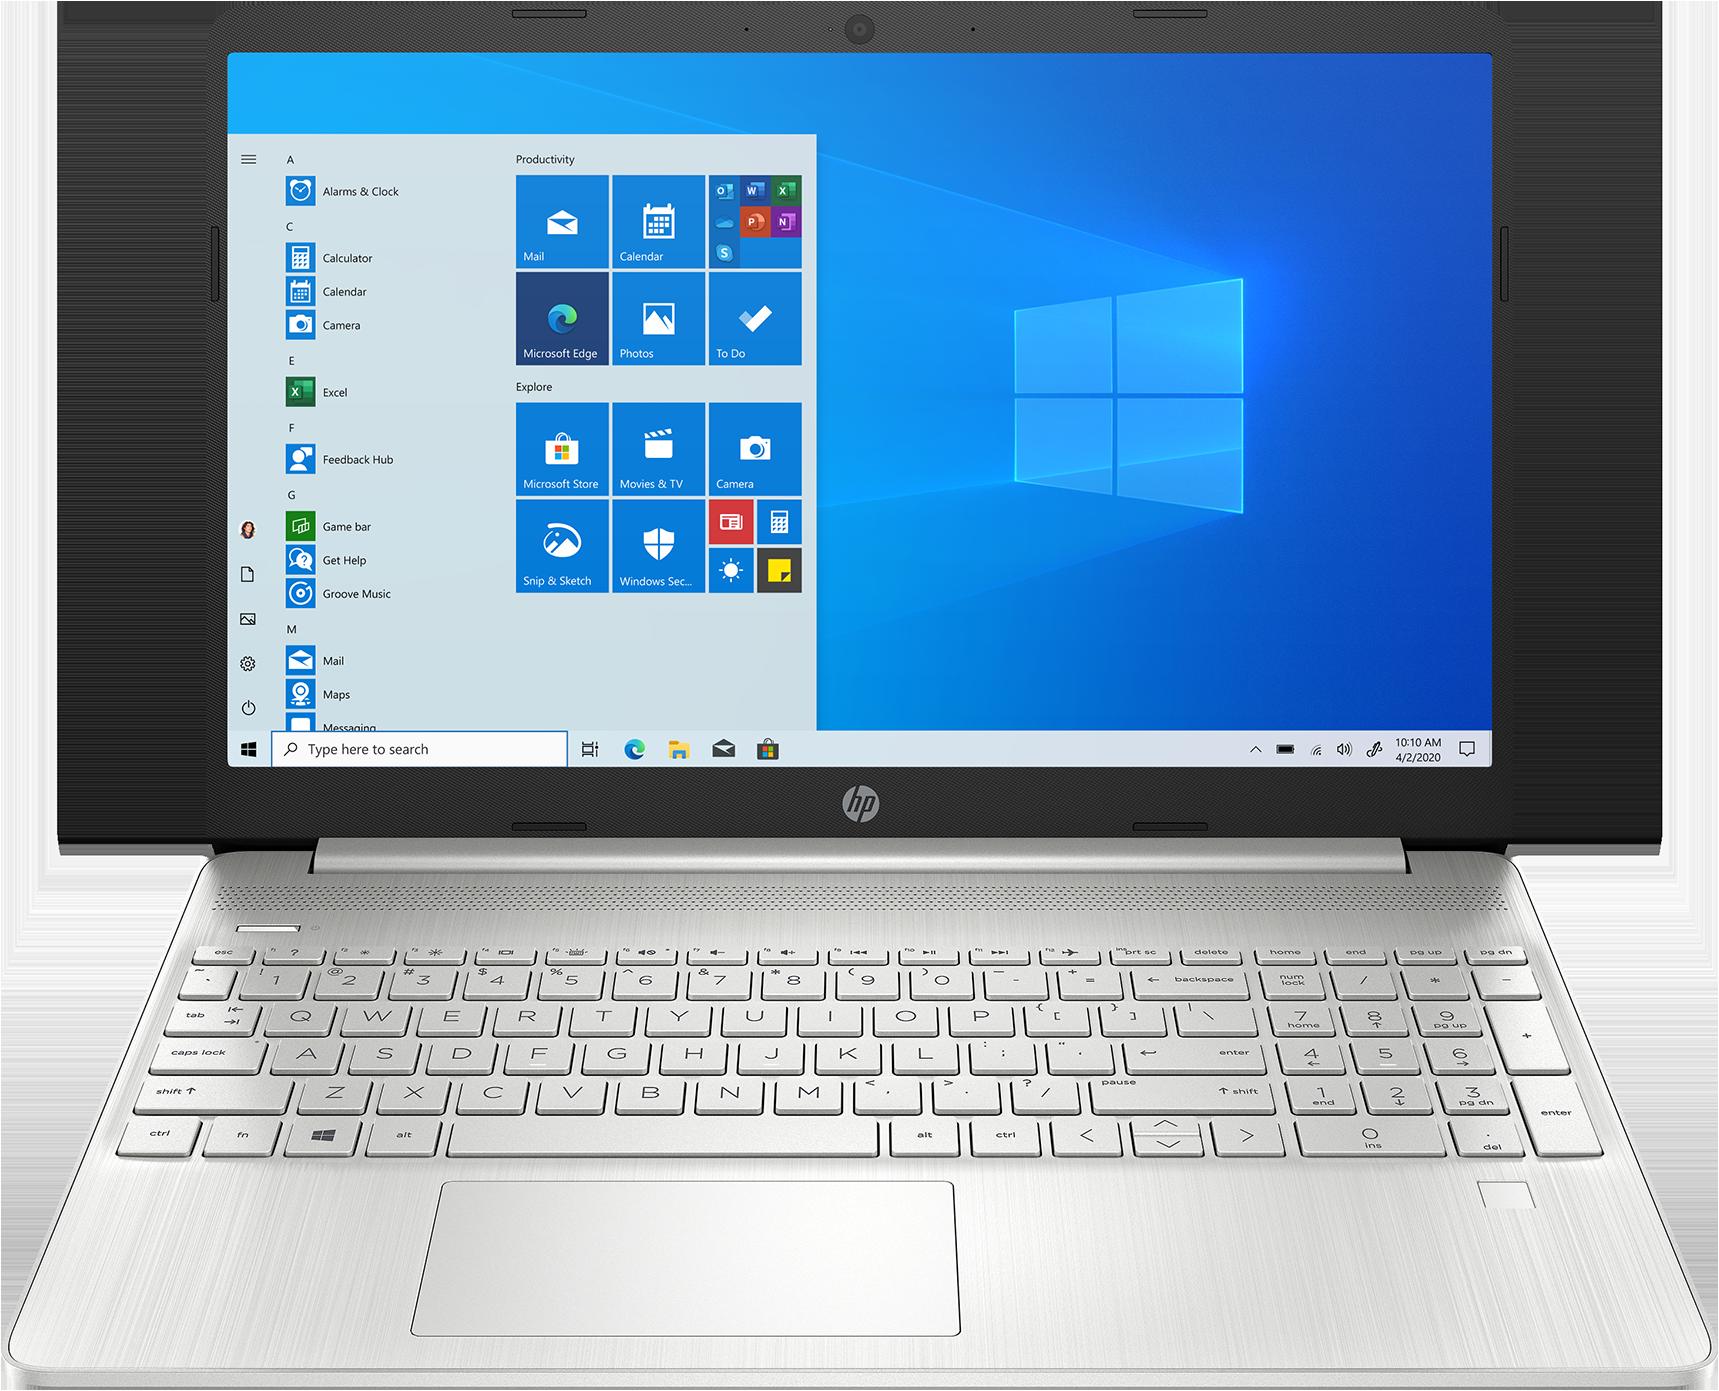 HP Notebook 15s-fq1055tu 15.6 Laptop 15.6 inch Full HD display Intel Core i7-1065G7 8 GB memory/256 GB SSD Intel Iris Plus Graphics